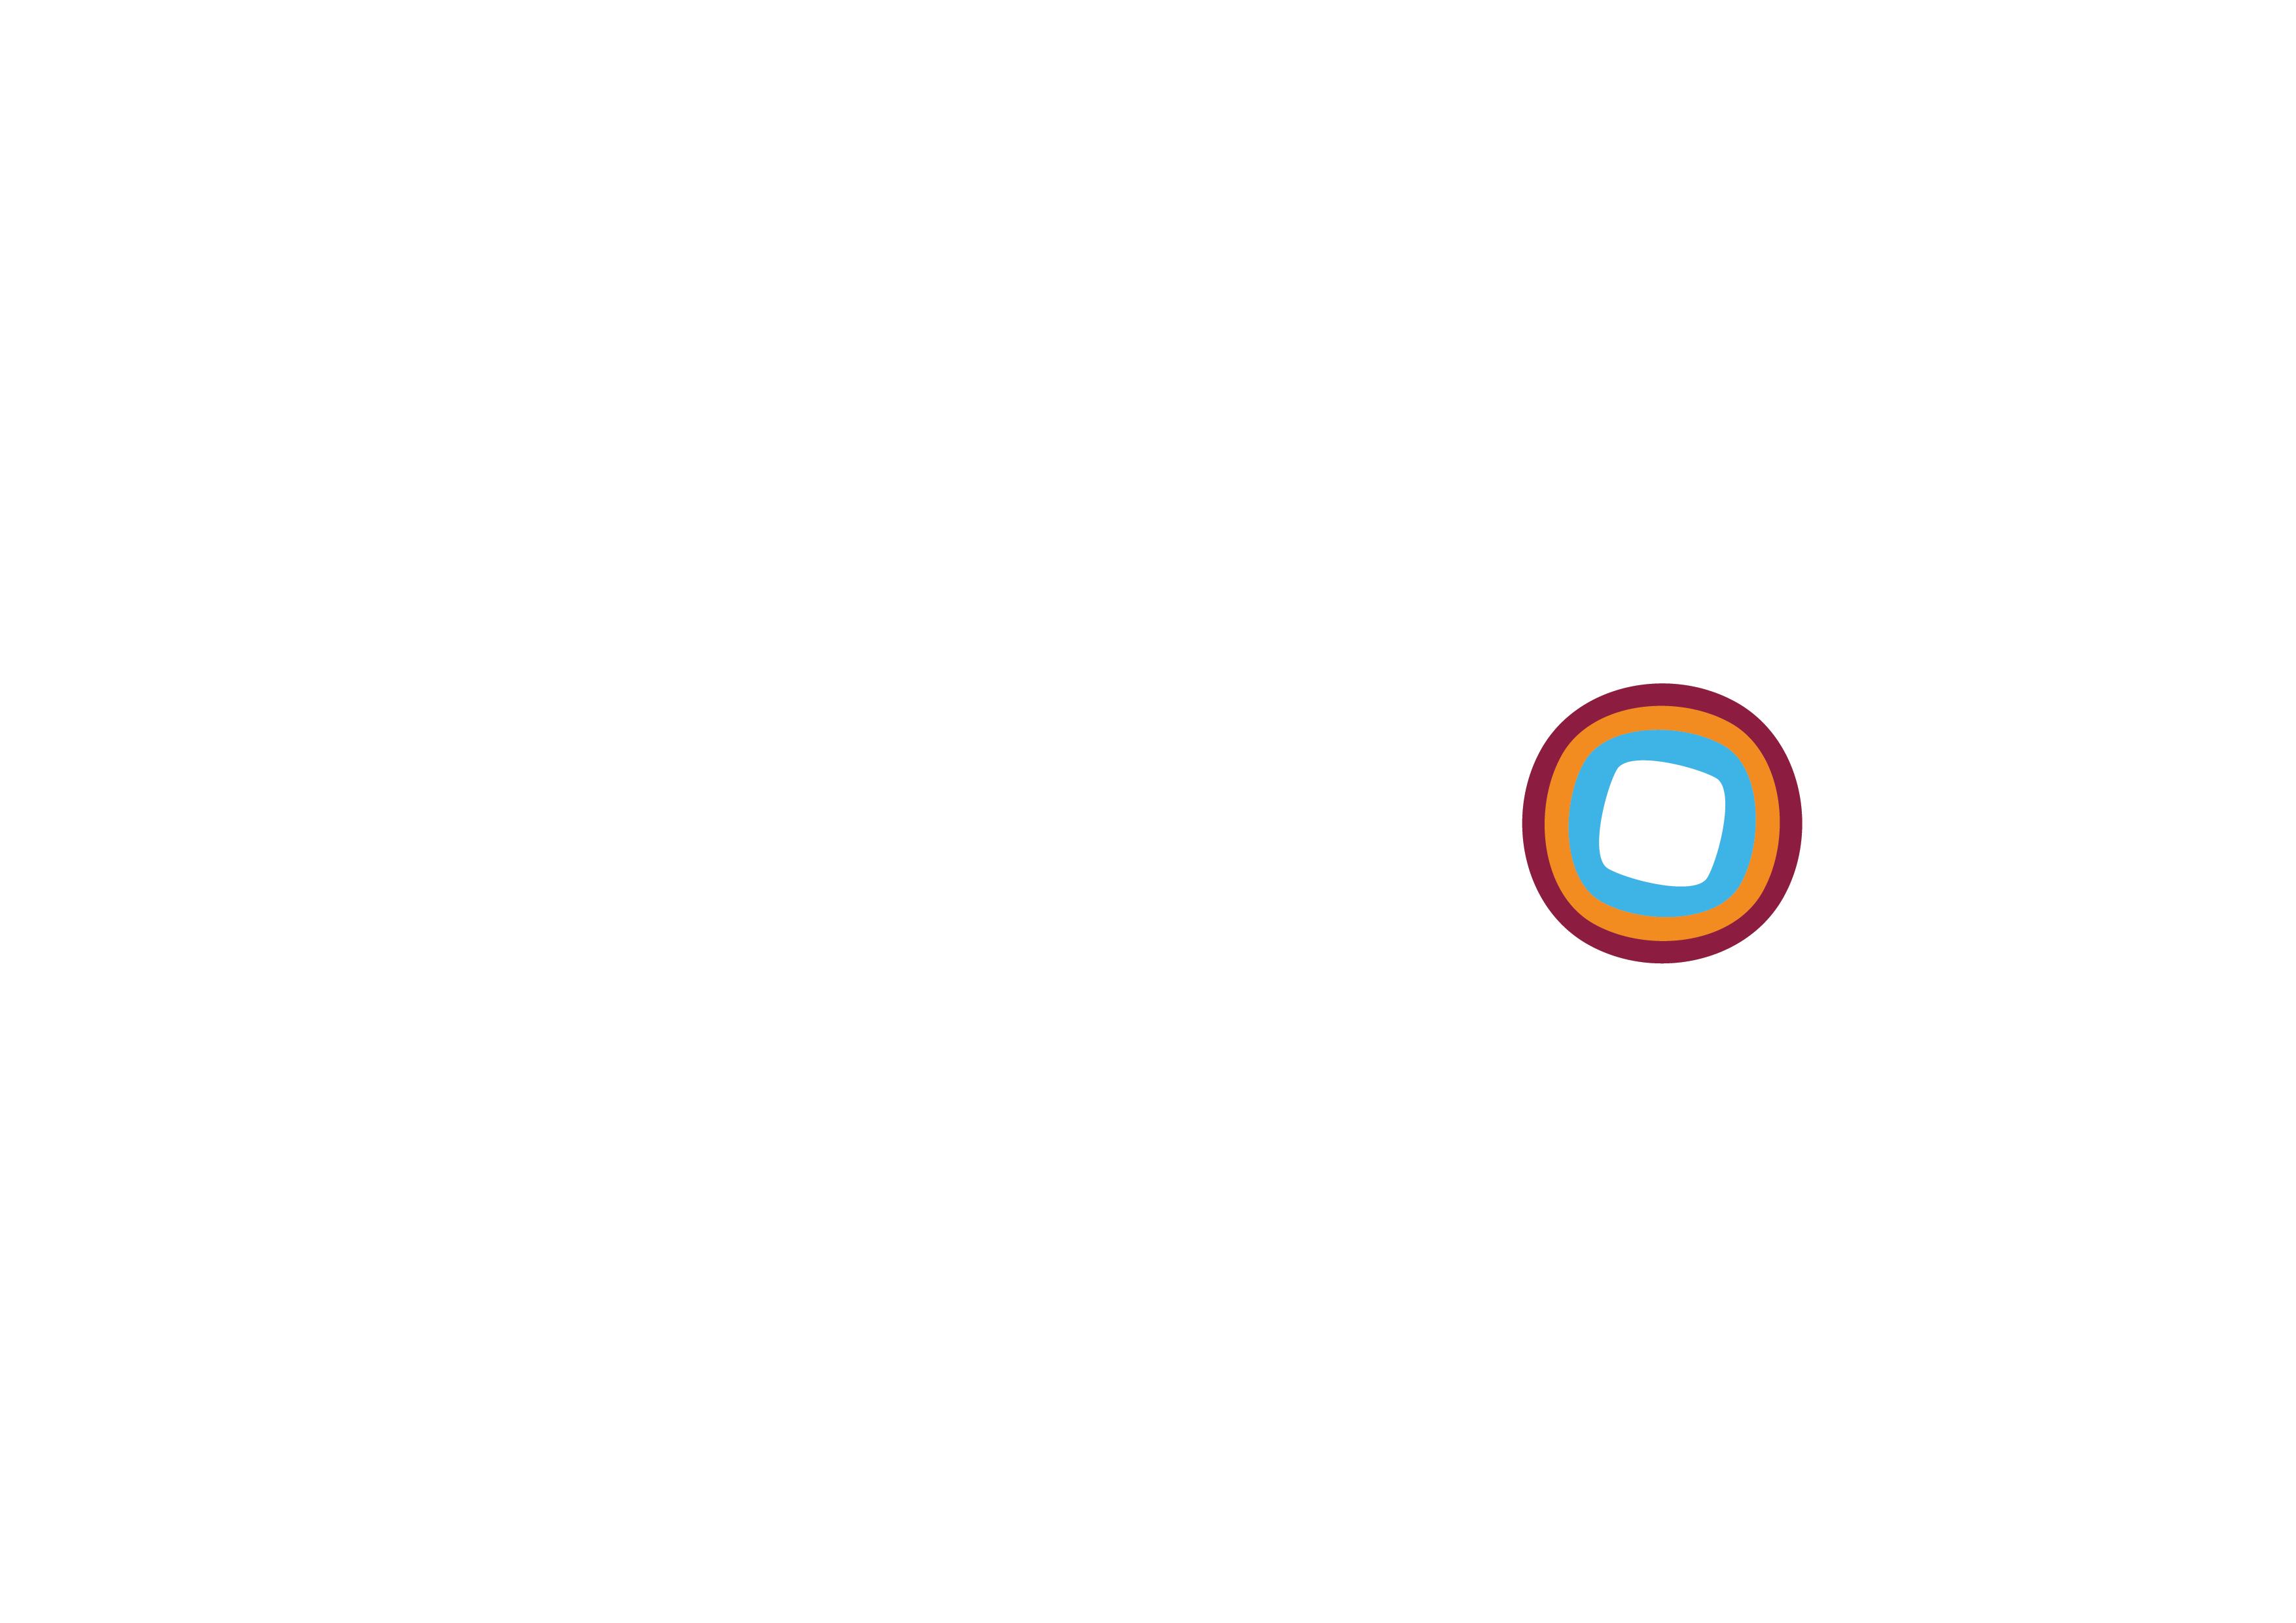 Qasswa Logo in white شعار القصواء بالأبيض